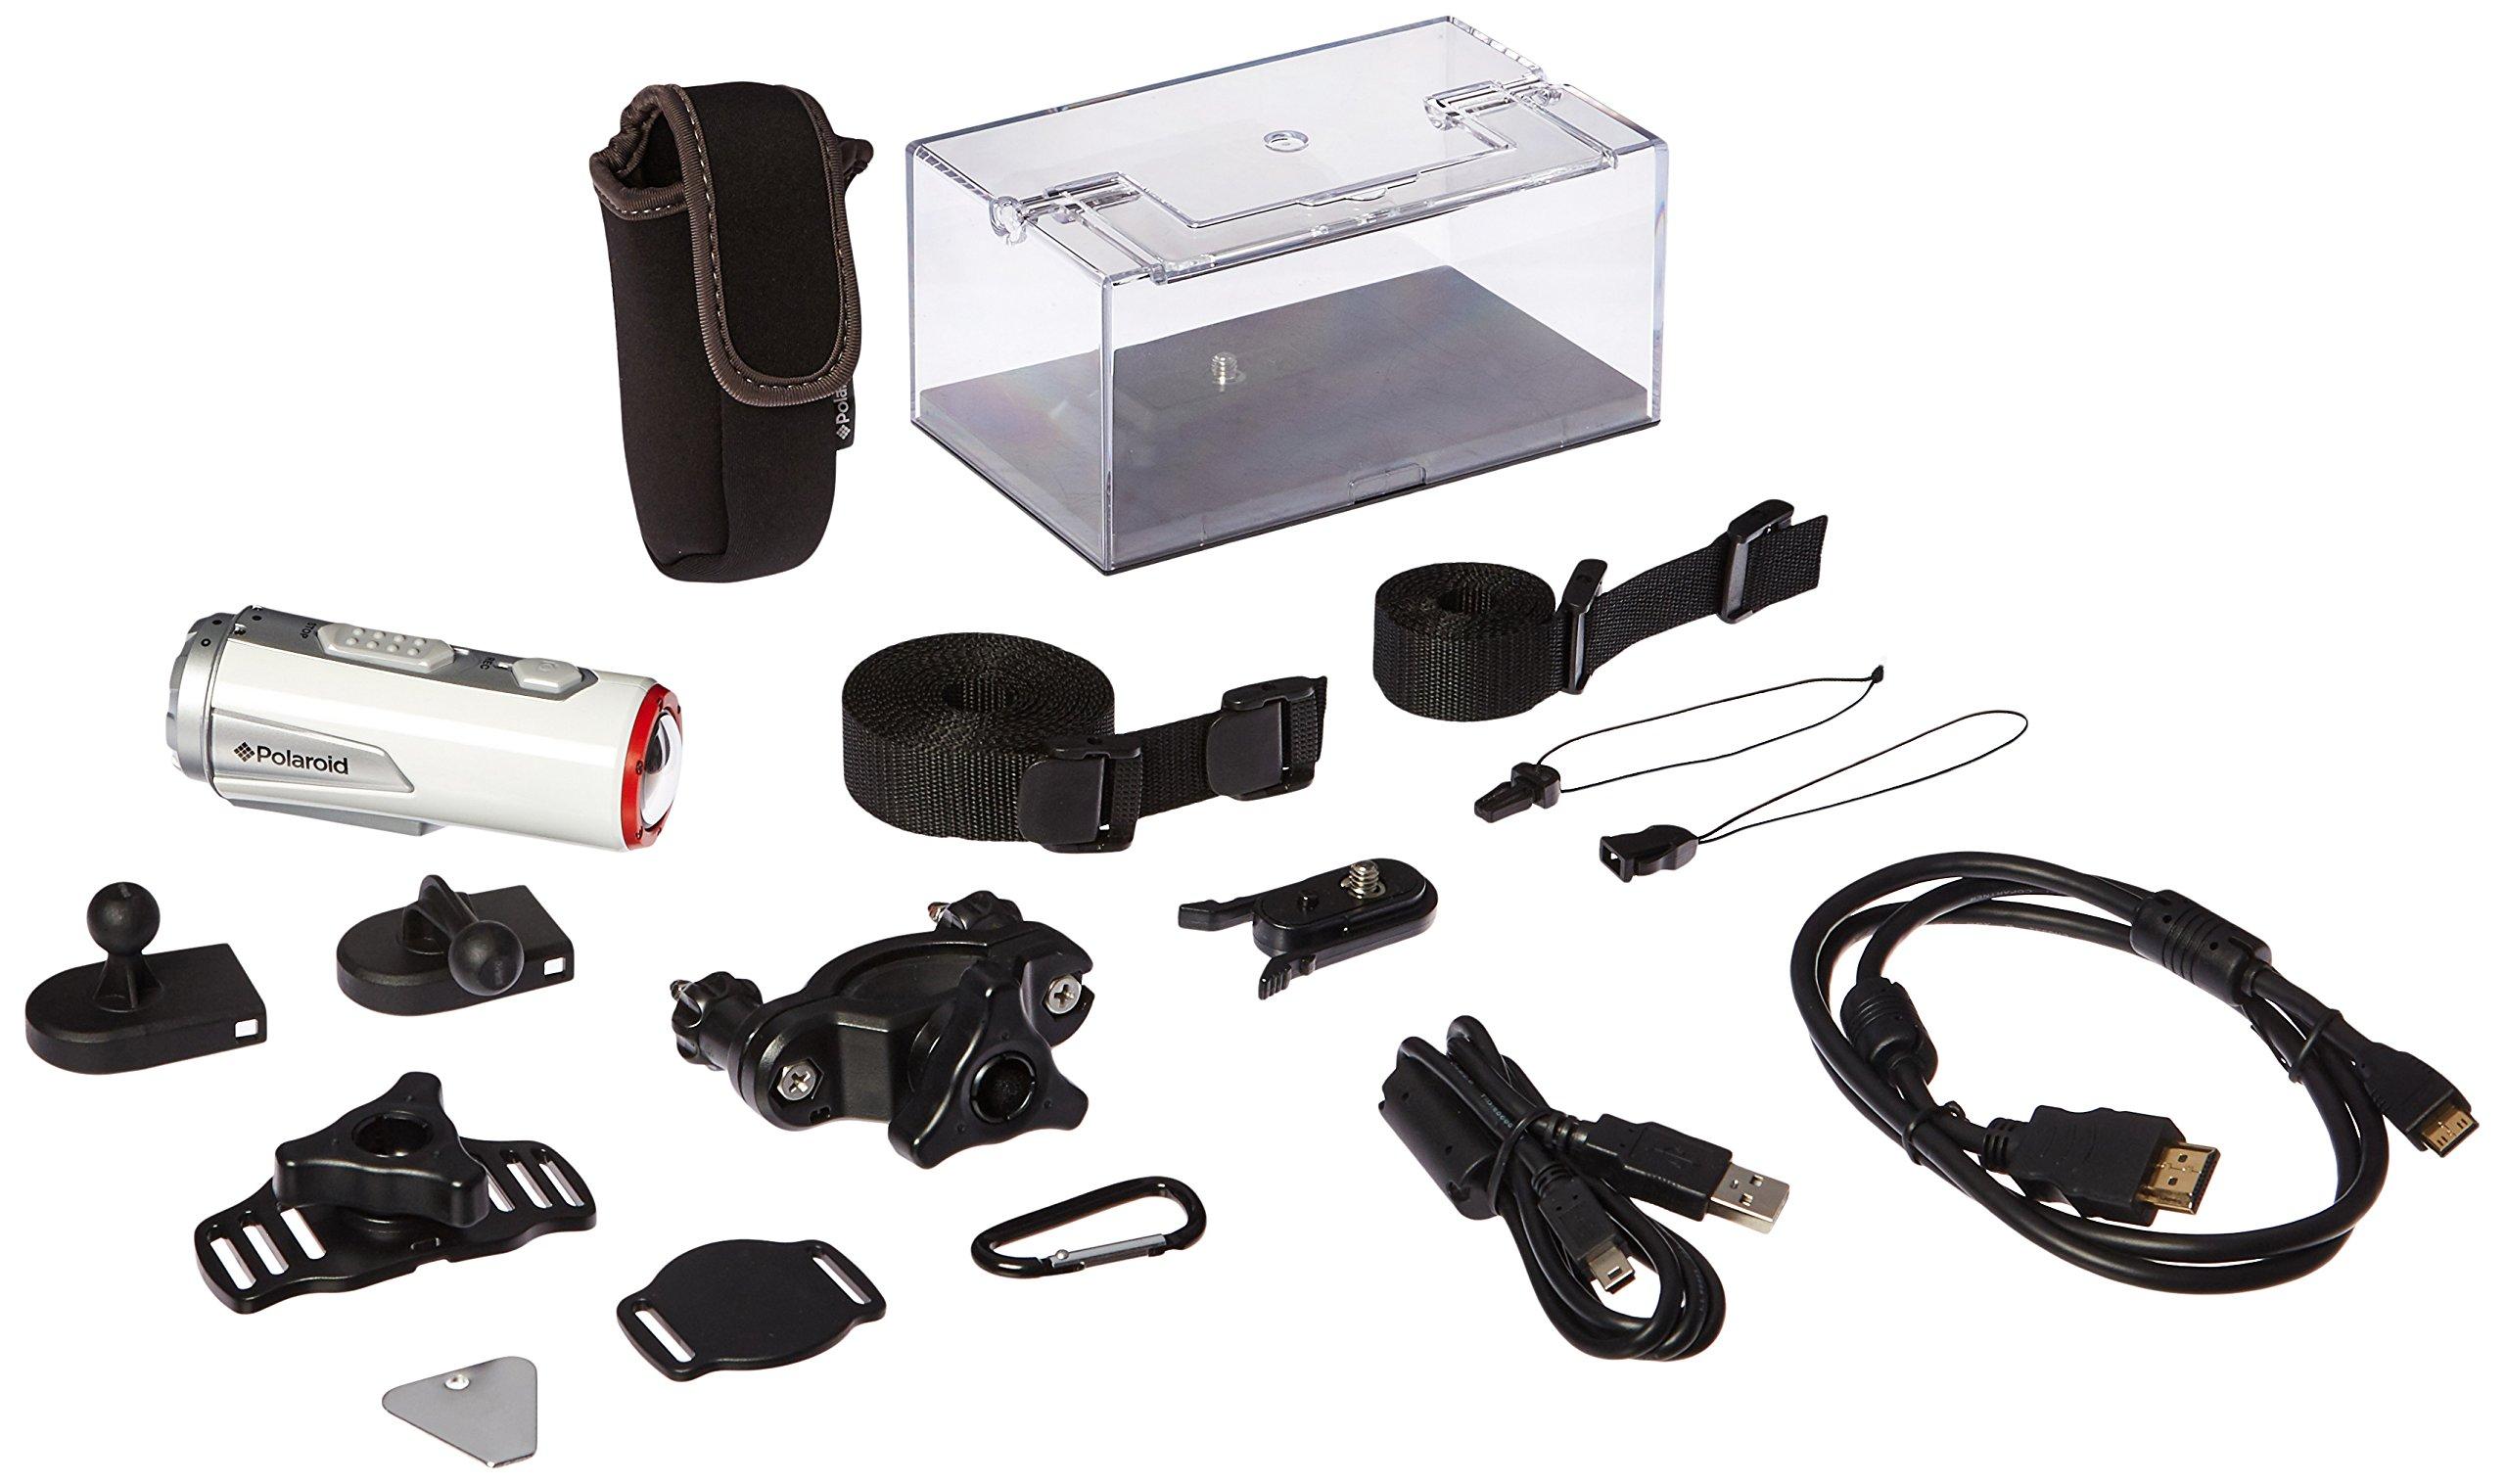 Polaroid XS100 Lens Replacement Kit